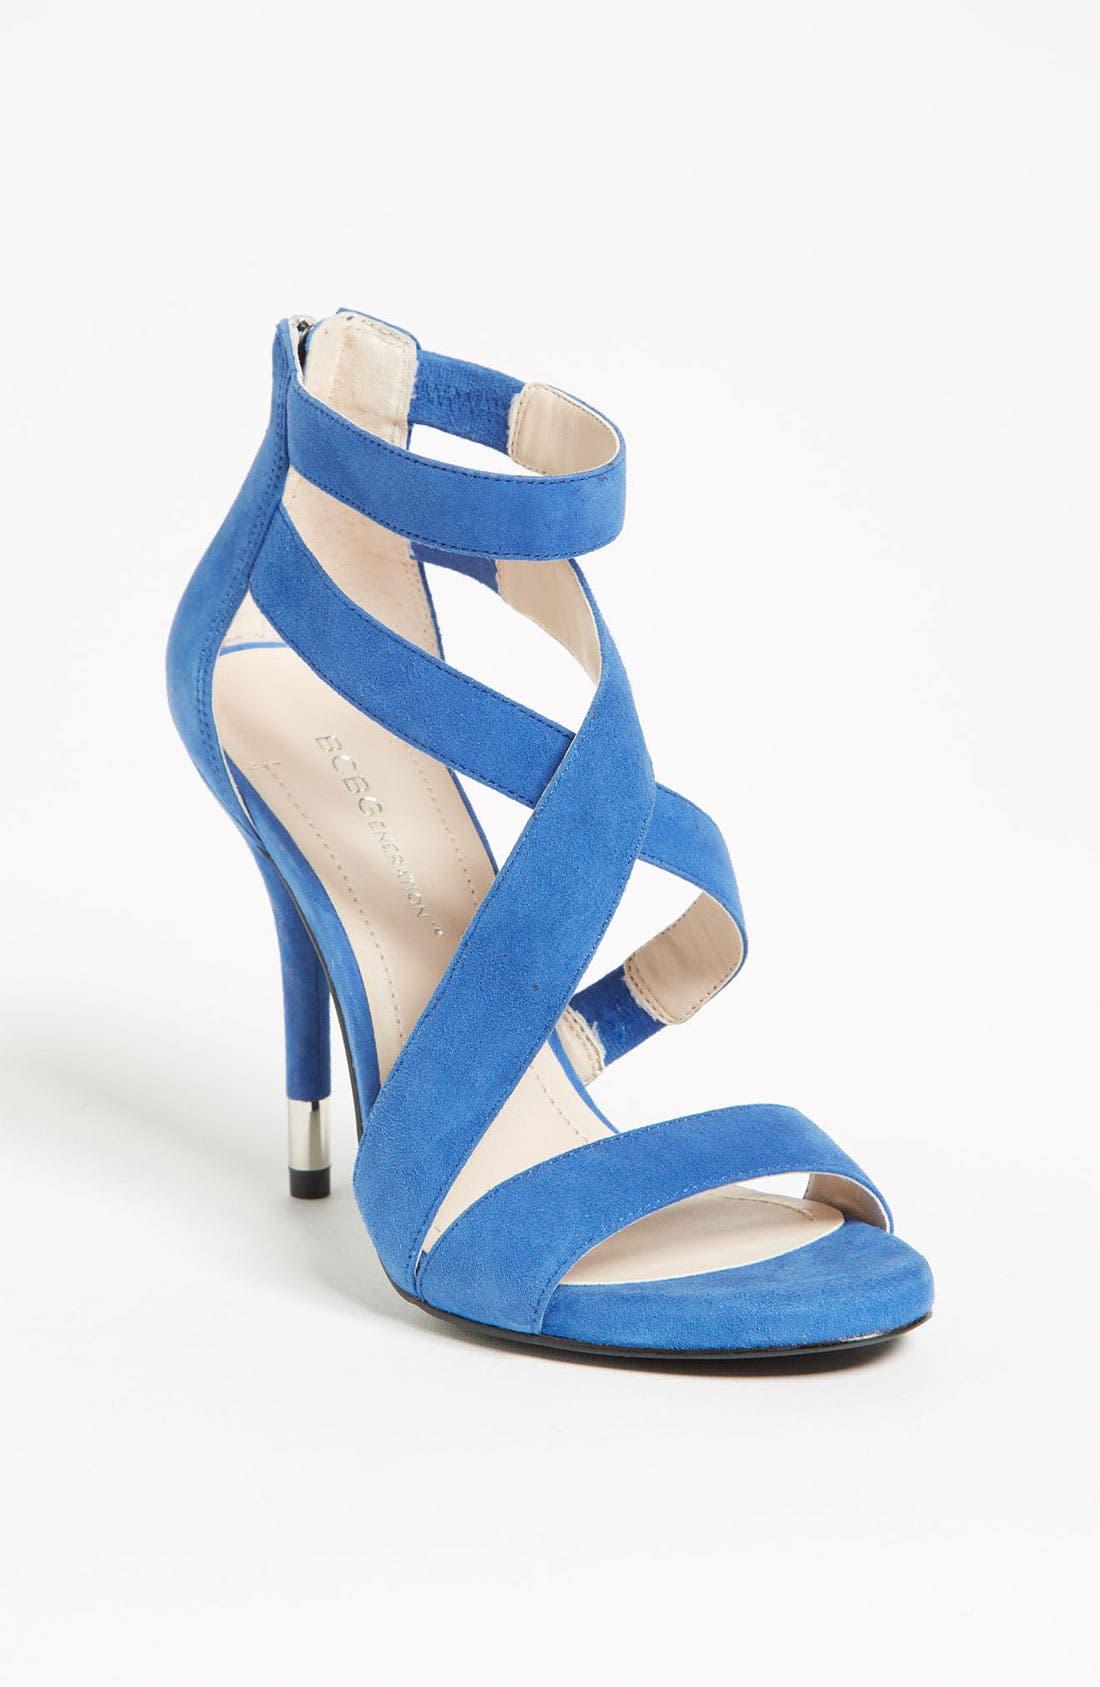 Main Image - BCBGeneration 'Ivie' Sandal